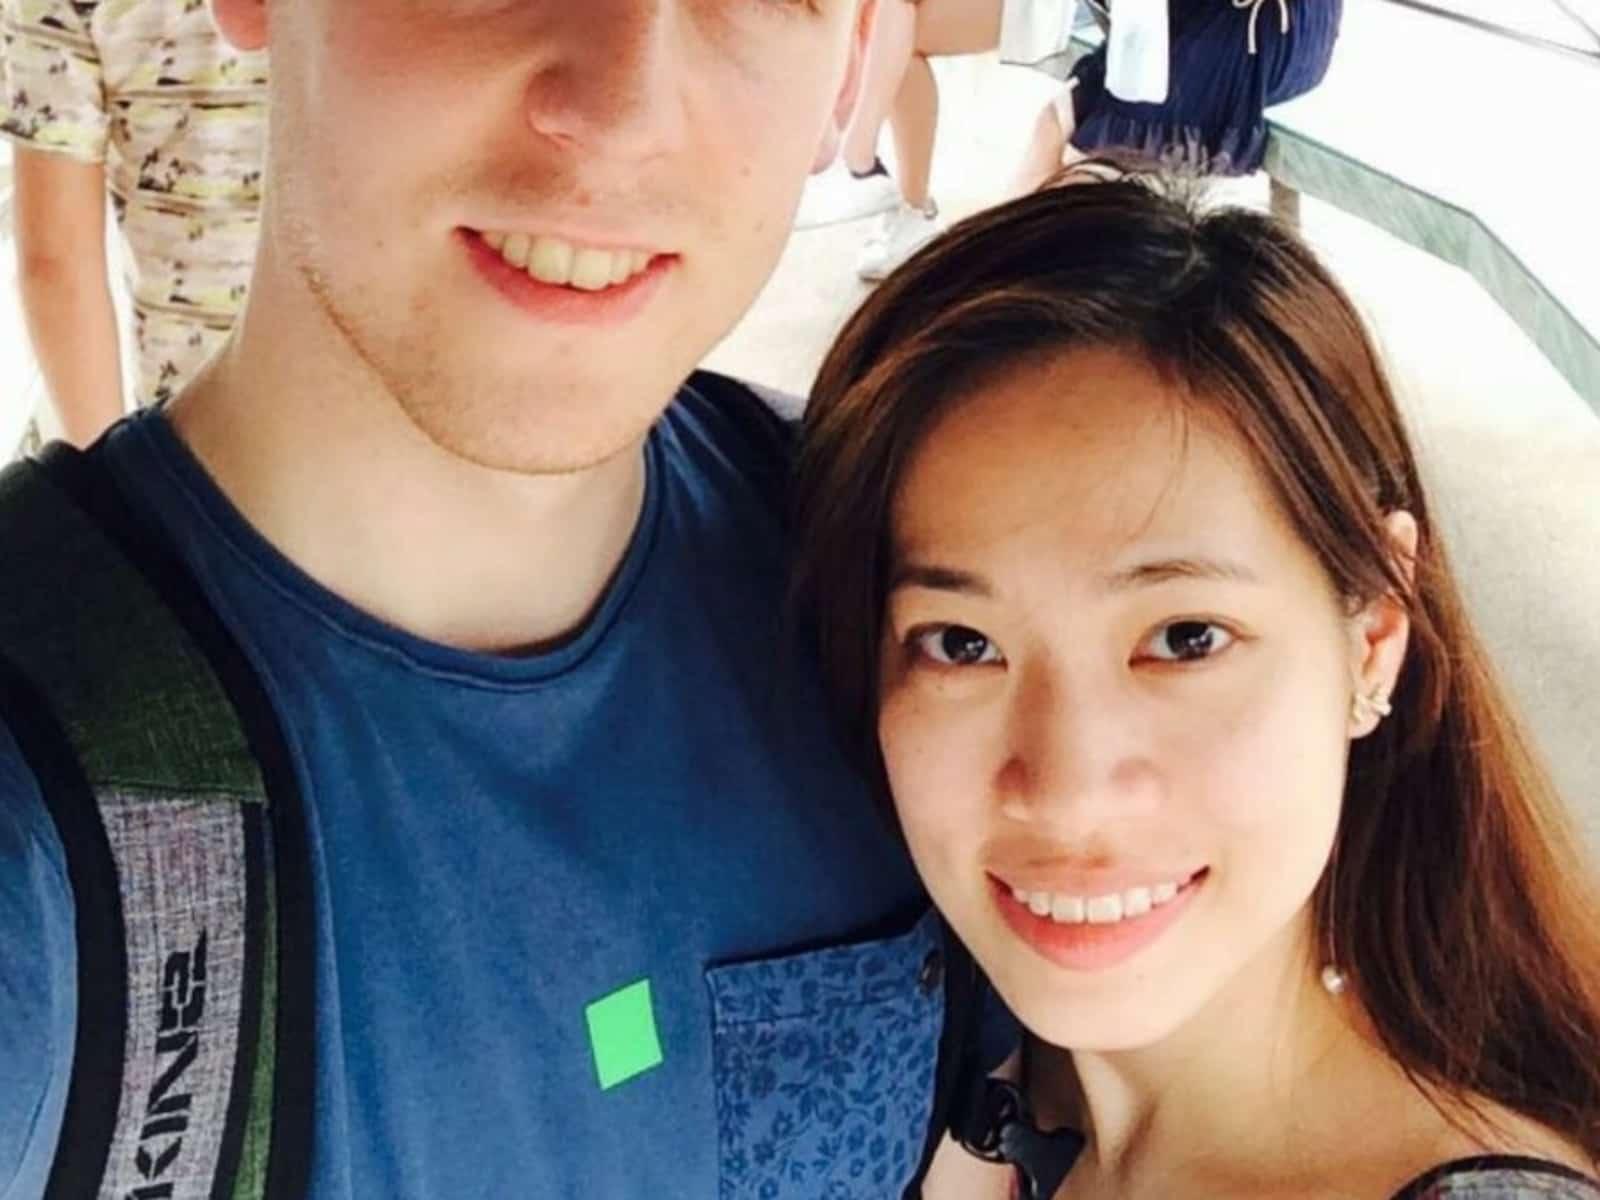 Sander & Eunice from Kowloon, Hong Kong